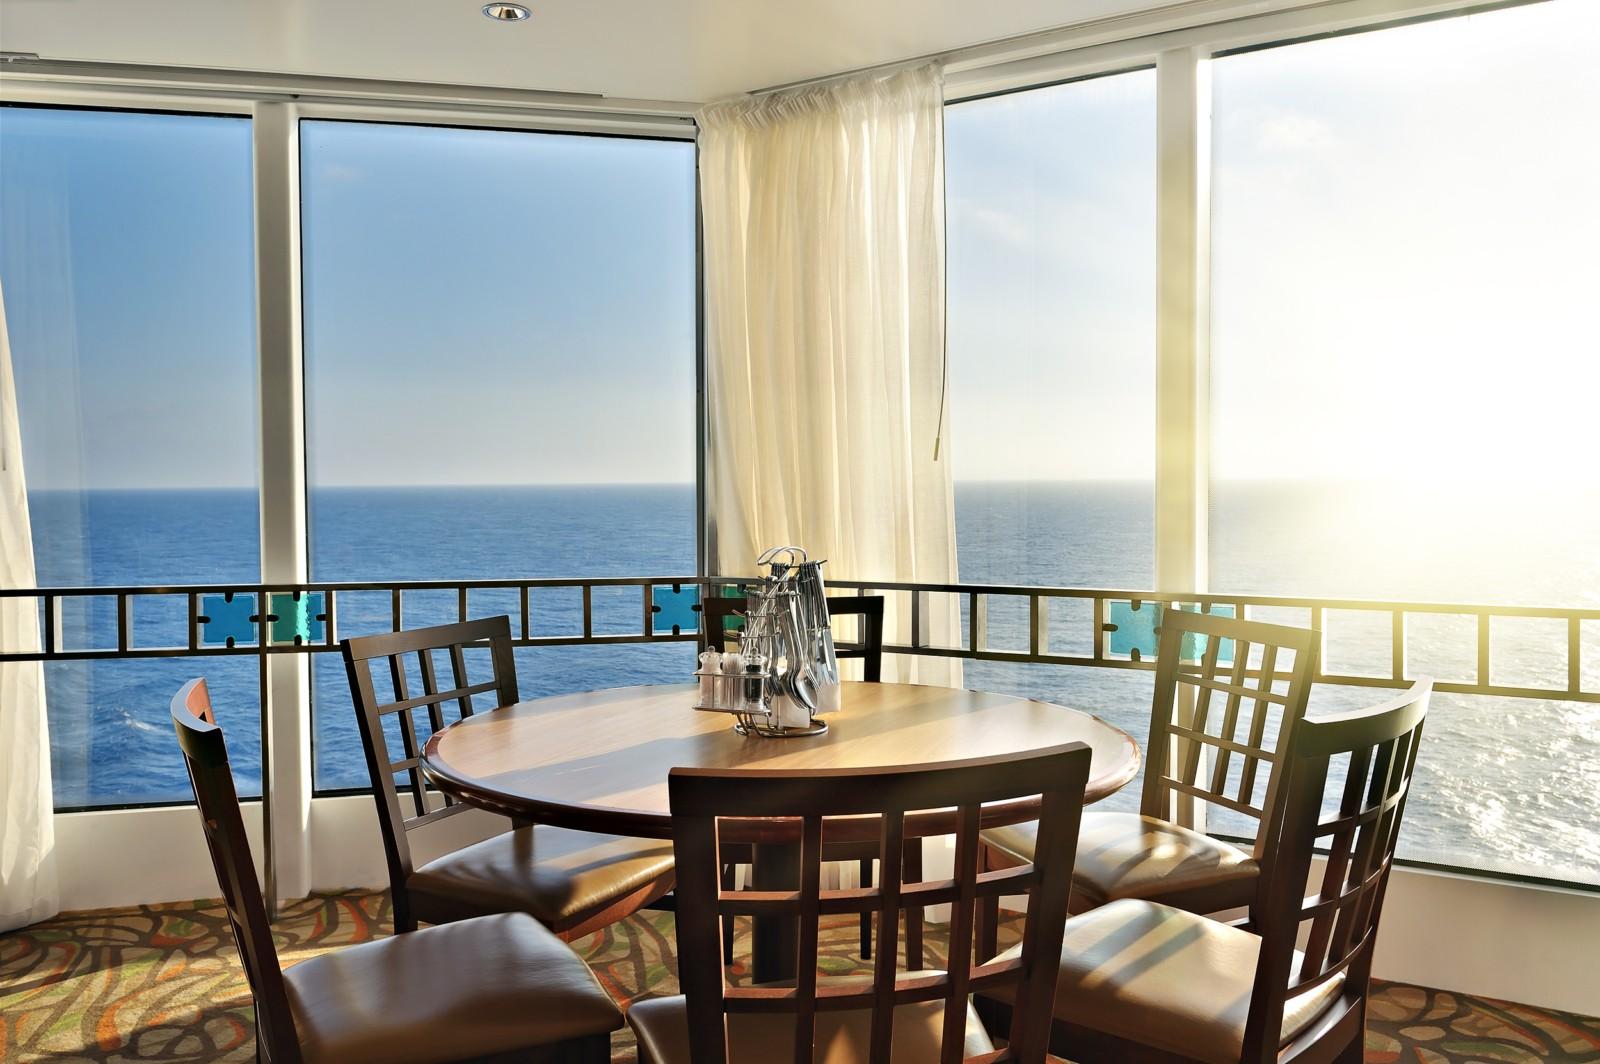 Solarglide Marine Curtains in Restaurant area